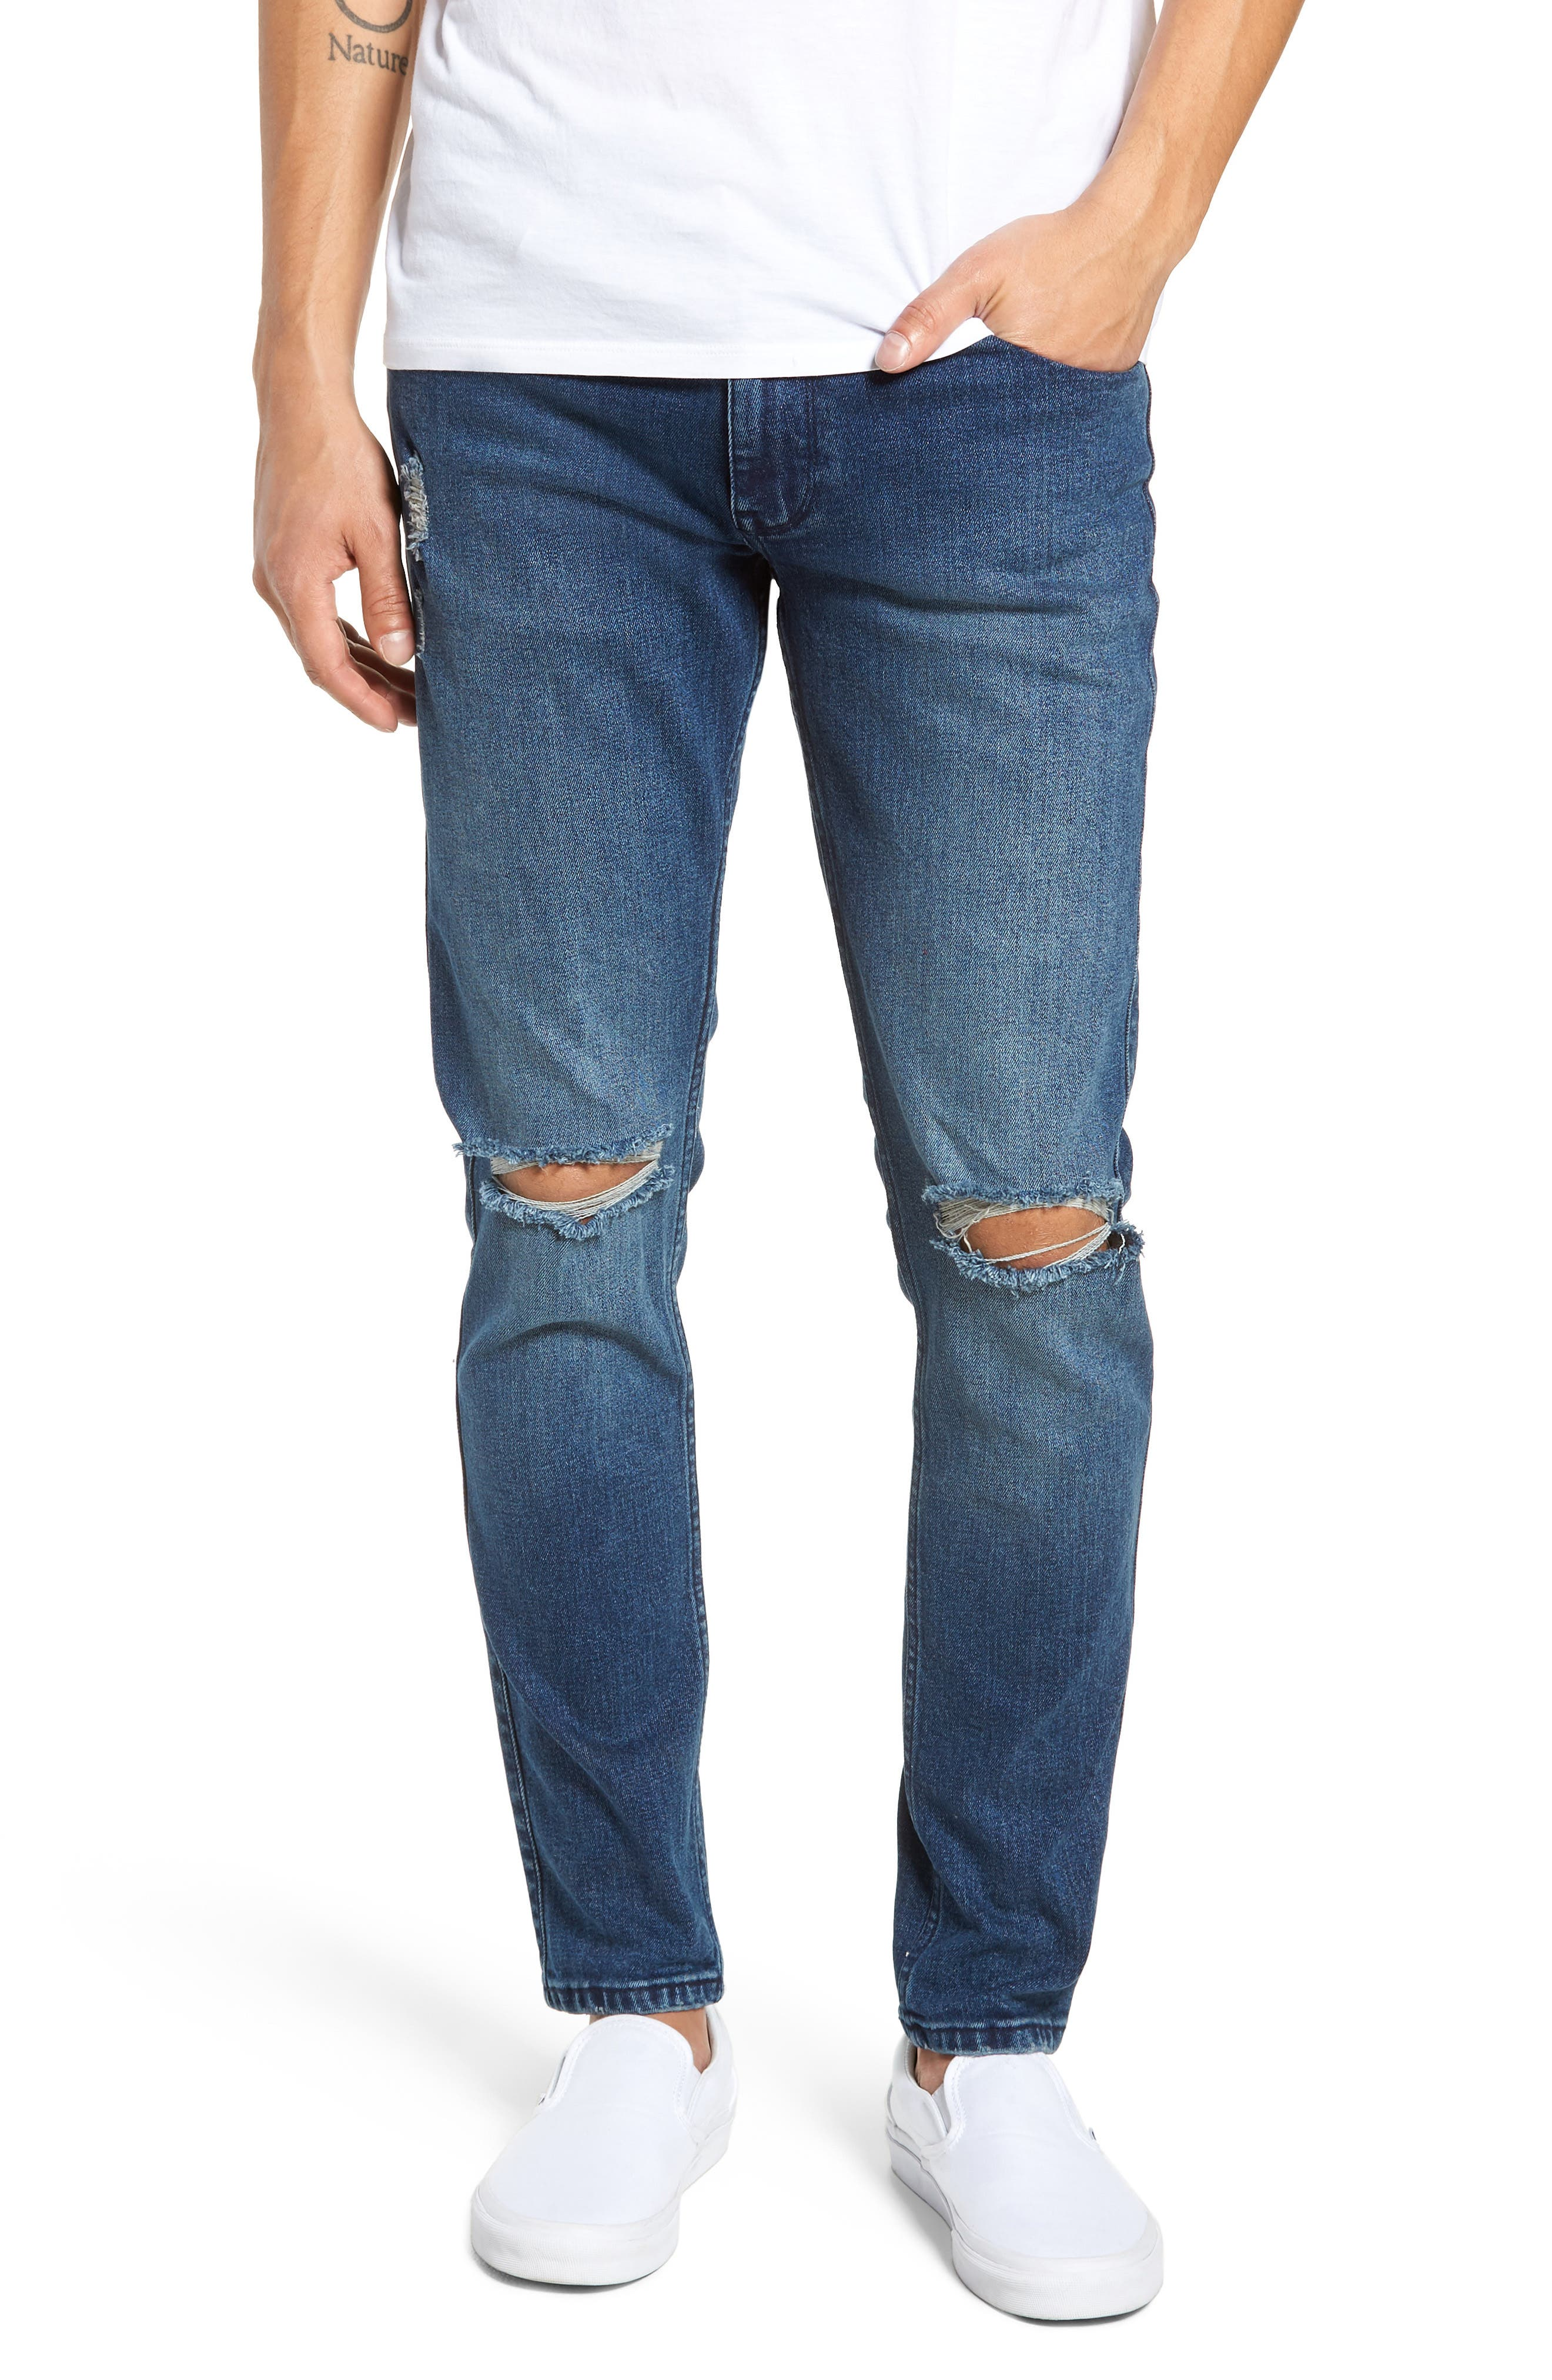 Clark Slim Straight Leg Jeans,                             Main thumbnail 1, color,                             WORN ASH BLUE DAMAGED